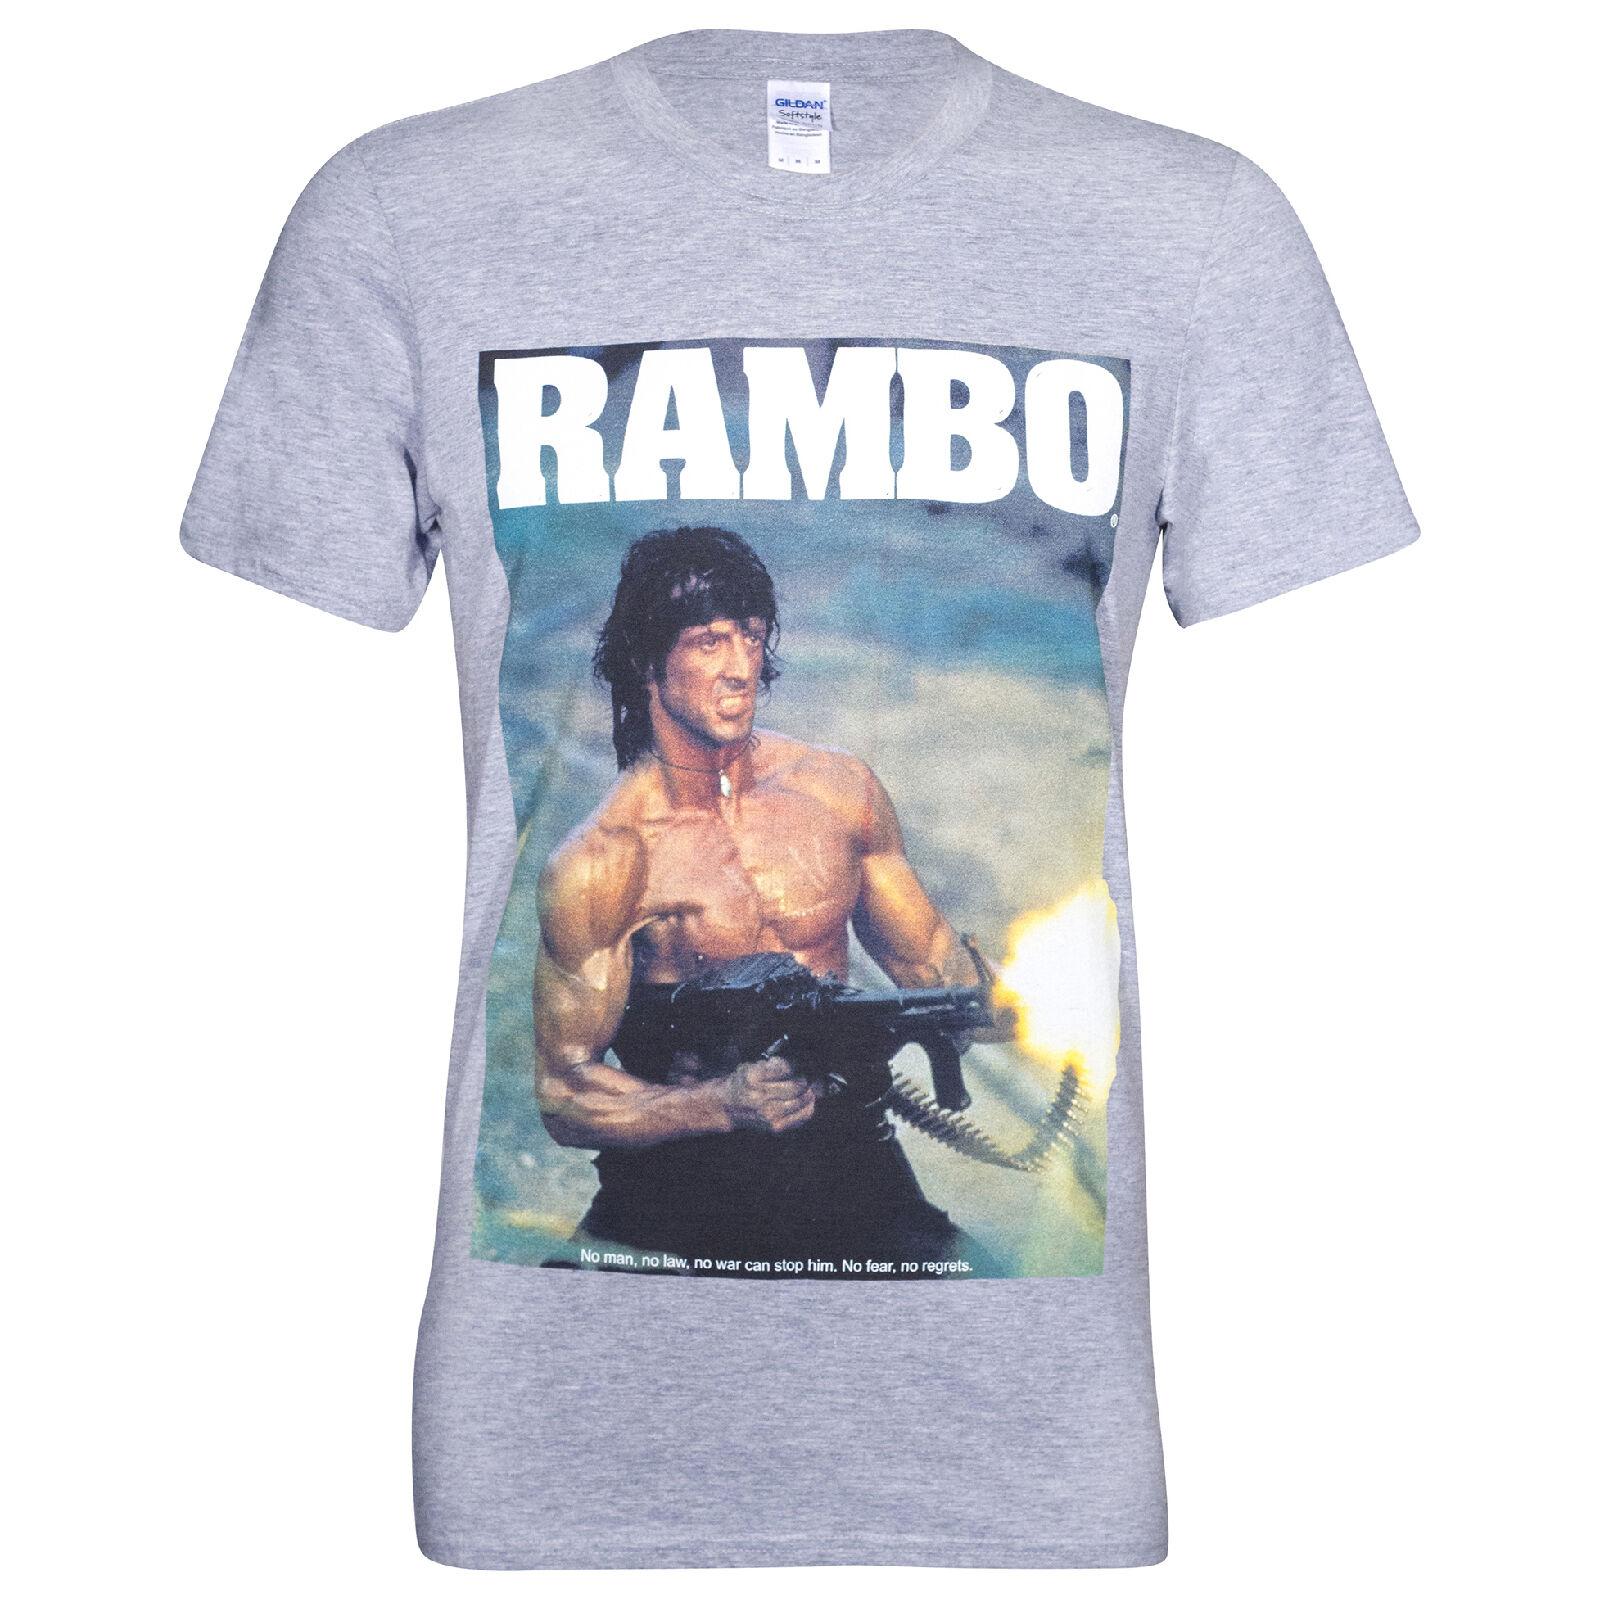 Geek Clothing Rambo Men's Gun T-Shirt - Grey - XXL - Grey